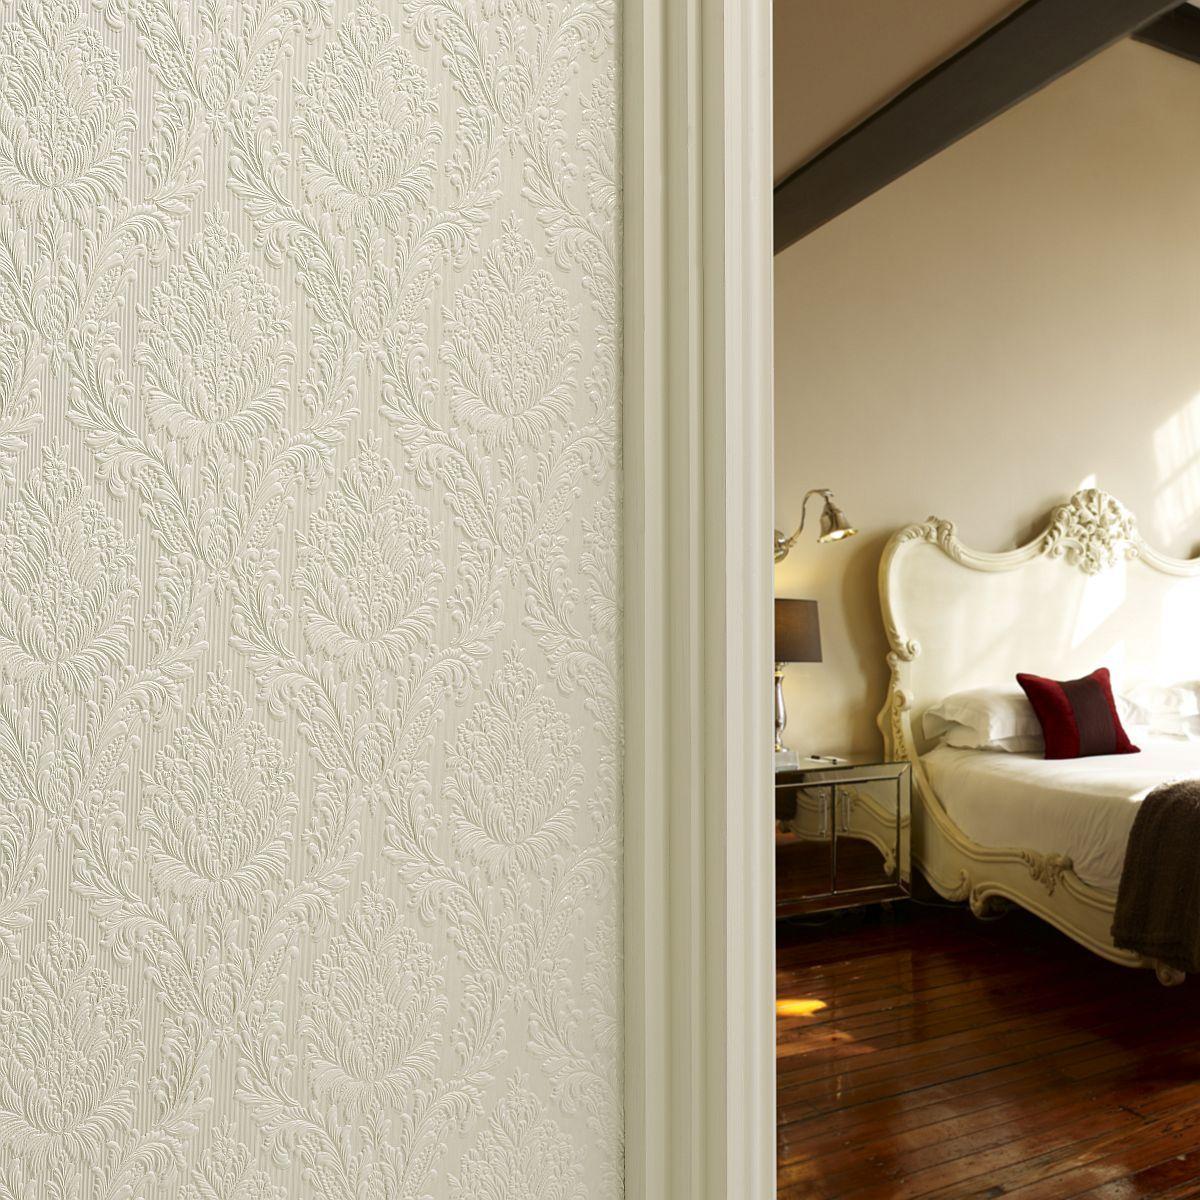 hochwertige tapeten und stoffe lincrusta sophia rd1888. Black Bedroom Furniture Sets. Home Design Ideas